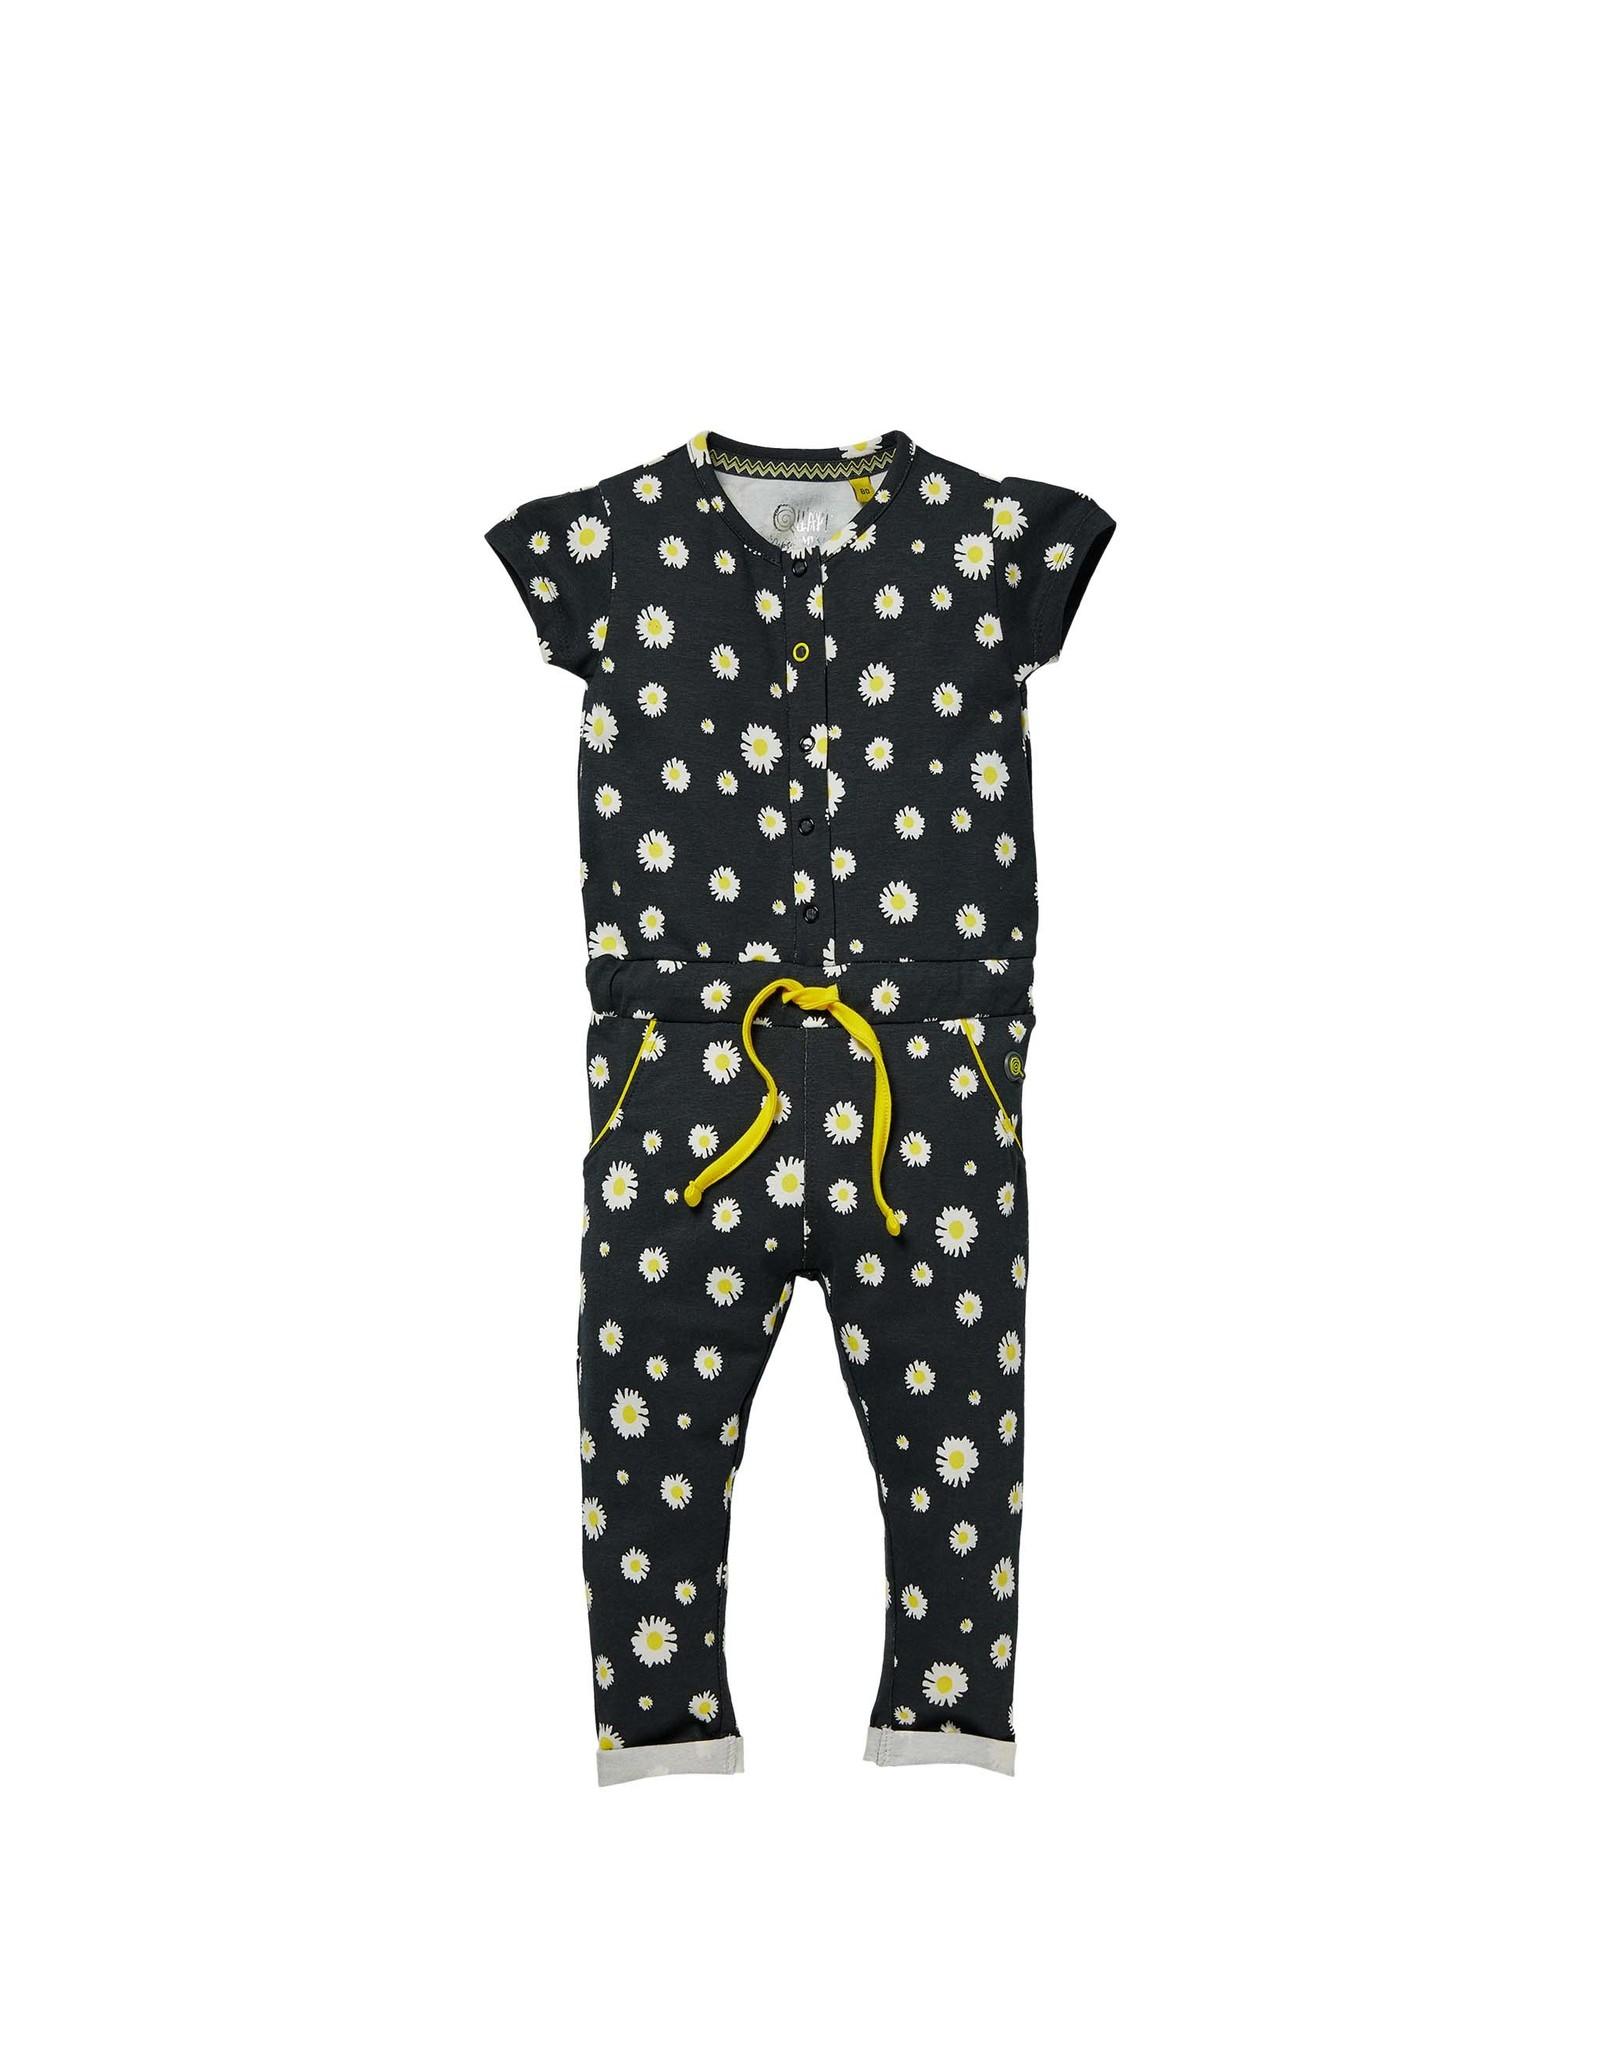 Quapi Quapi baby meisjes jumpsuit Glitter Black Daisy